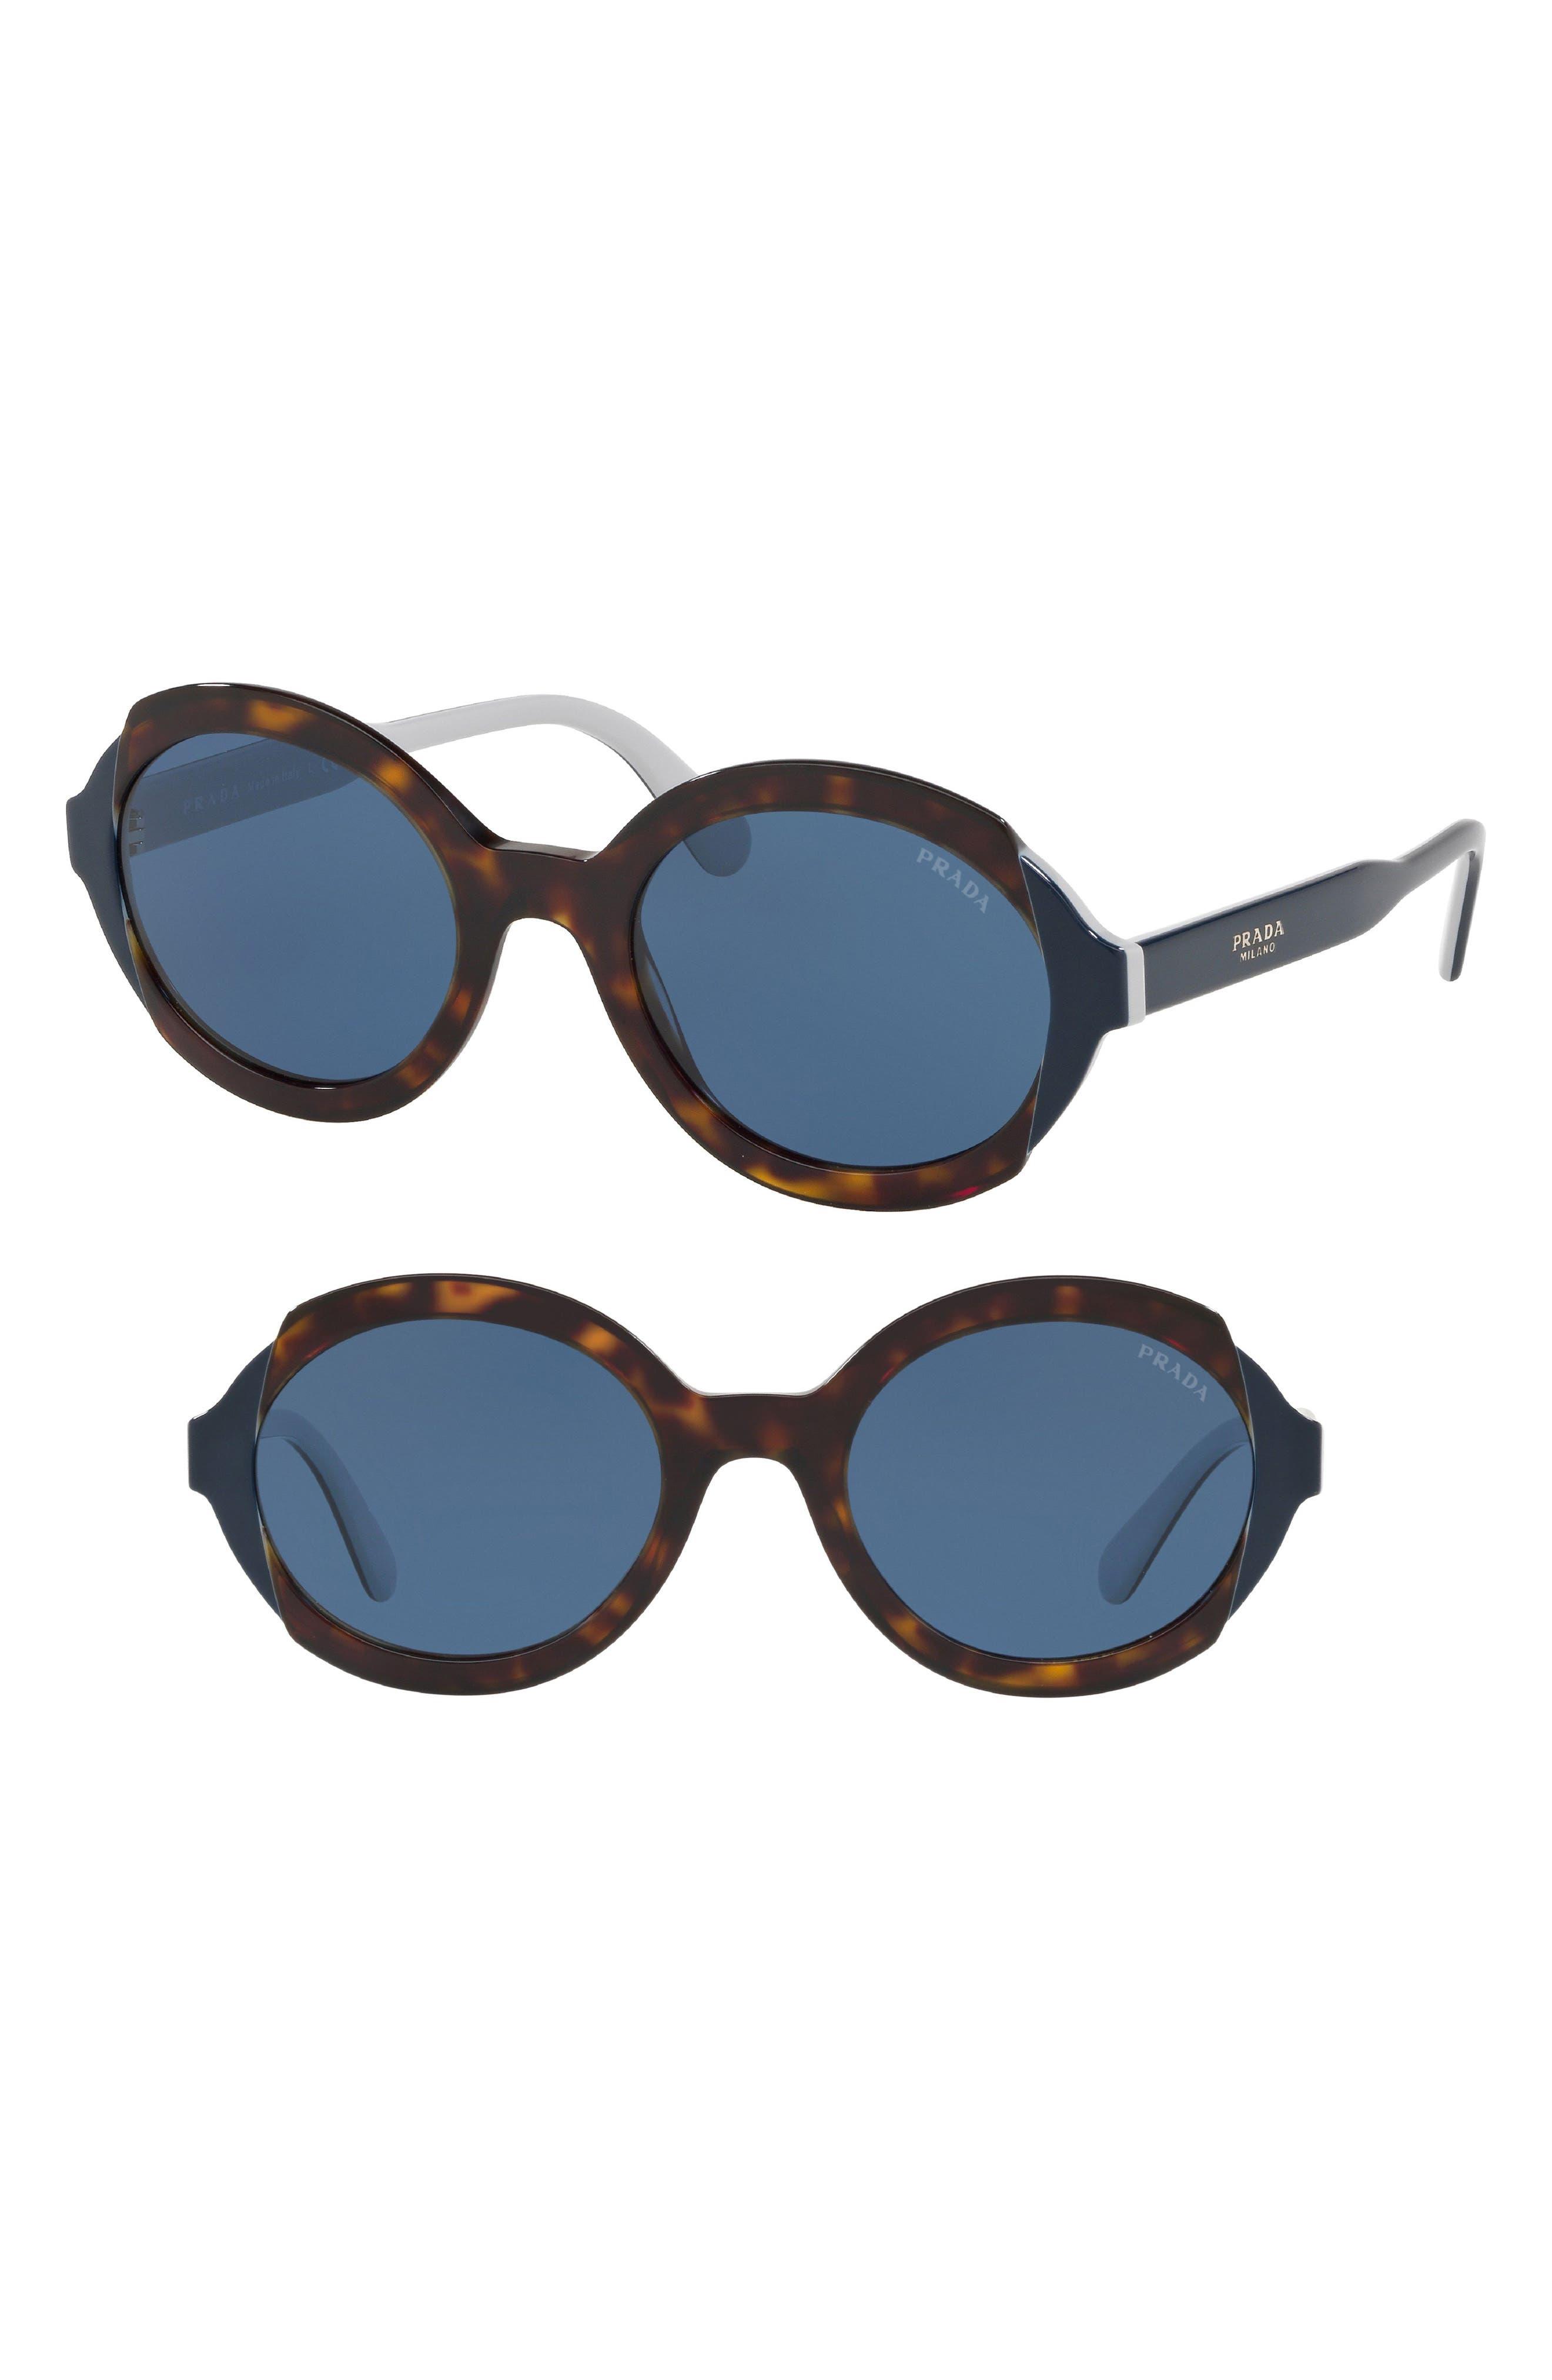 Etiquette 53mm Oval Sunglasses,                         Main,                         color, HAVANA SOLID